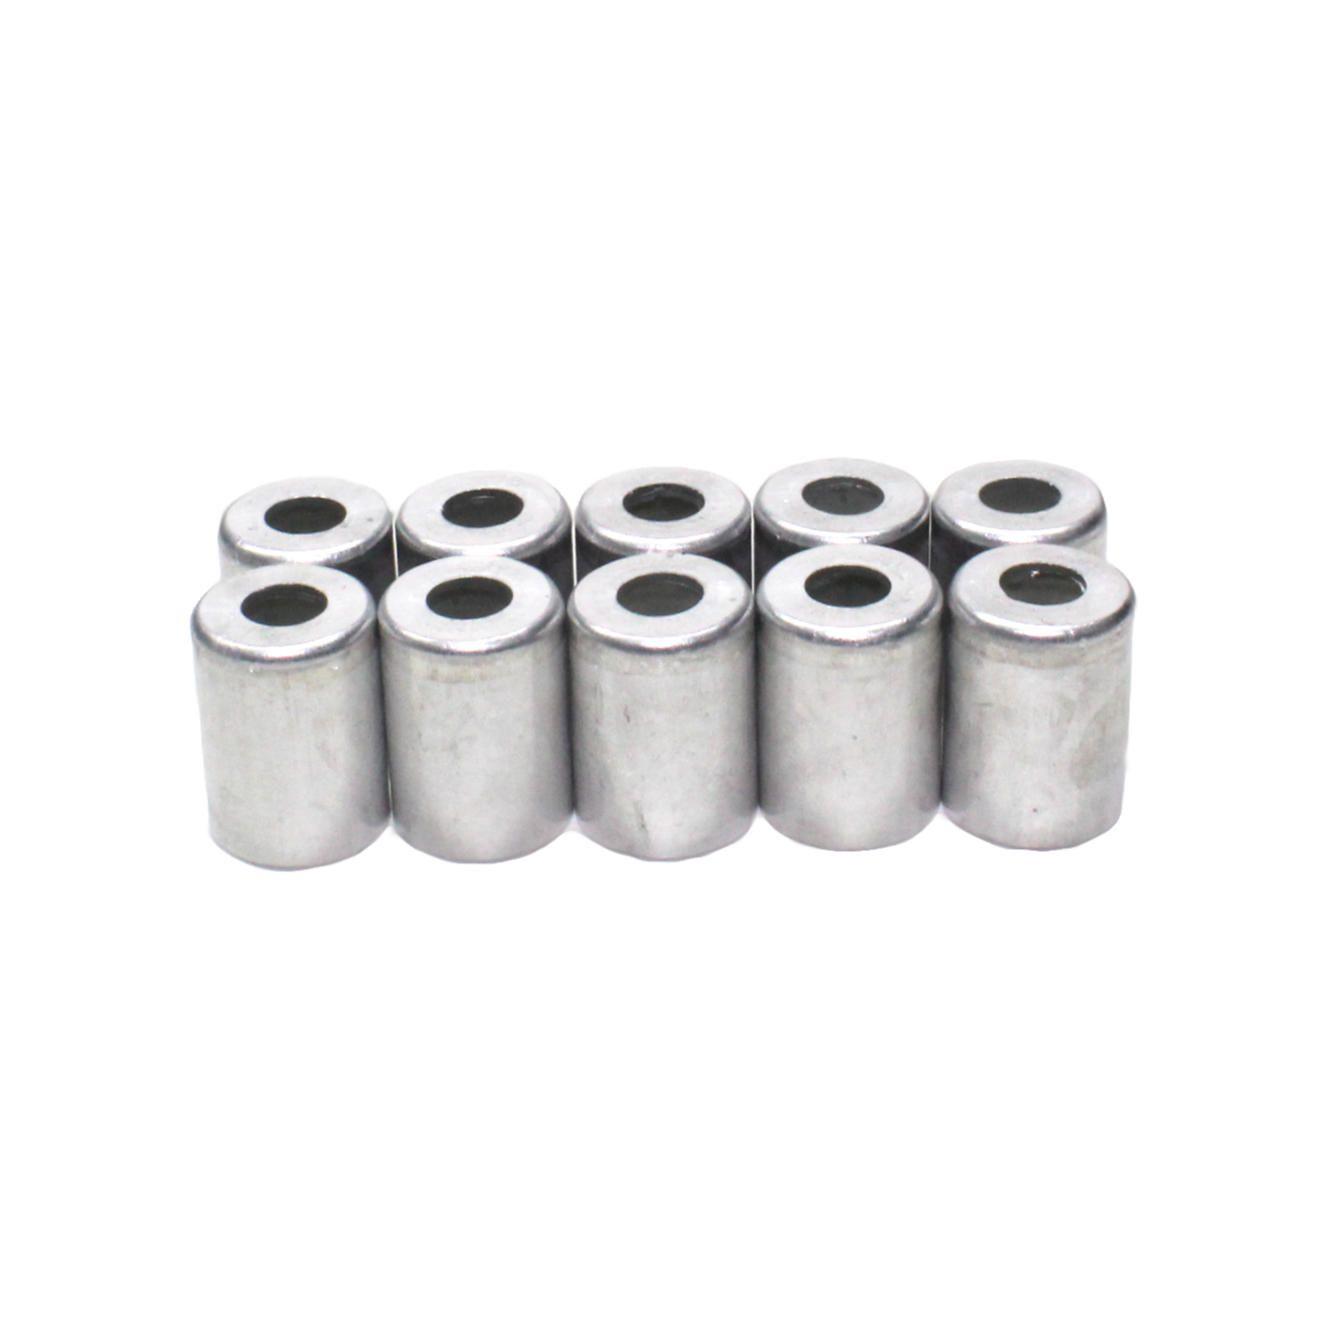 [10 uni] Caneca Copo Clip p/ Mangueira Ar Condicionado Universal 8 mm - Alumínio